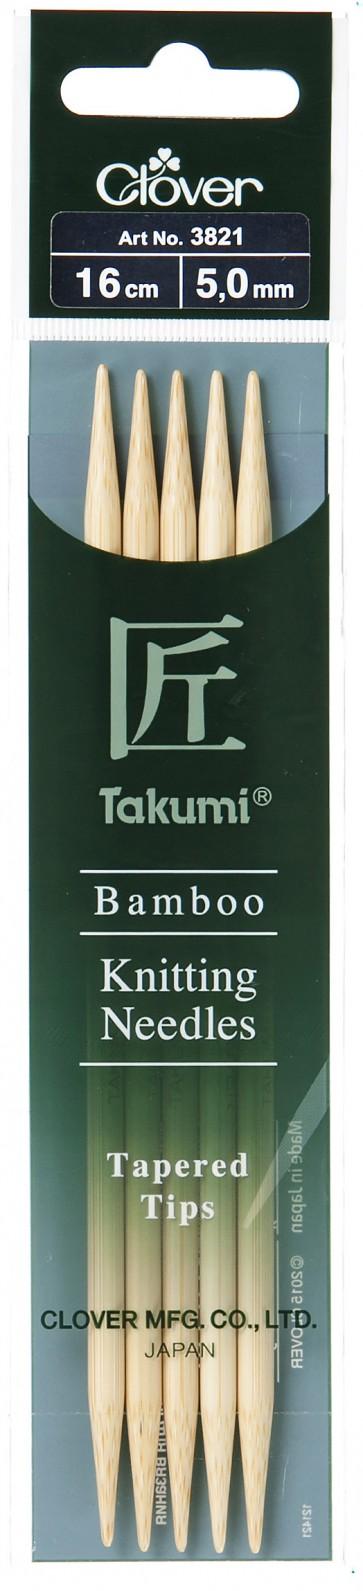 CLOVER Strumpfstrickndl Bambus Takumi 16cm/5.00mm